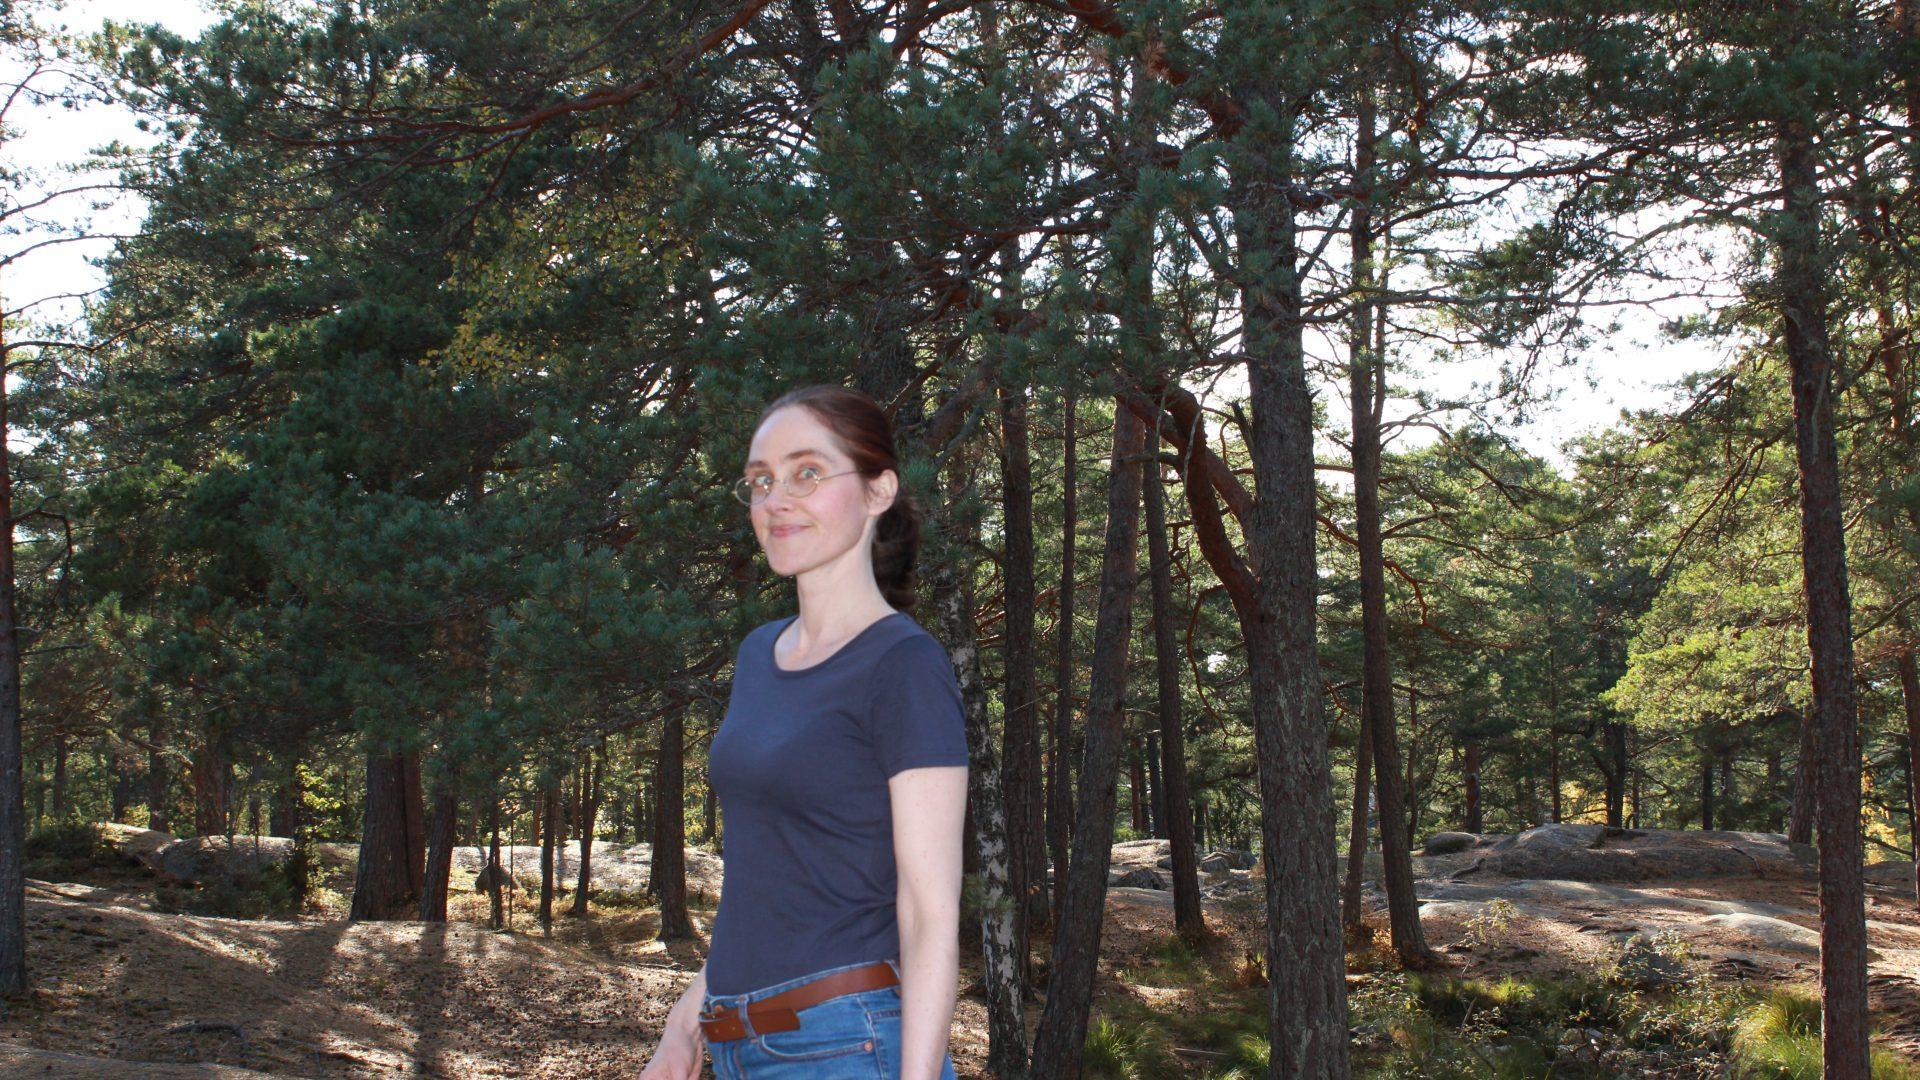 Clear-eyed Entrepreneur | Cecilia Elise Wallin